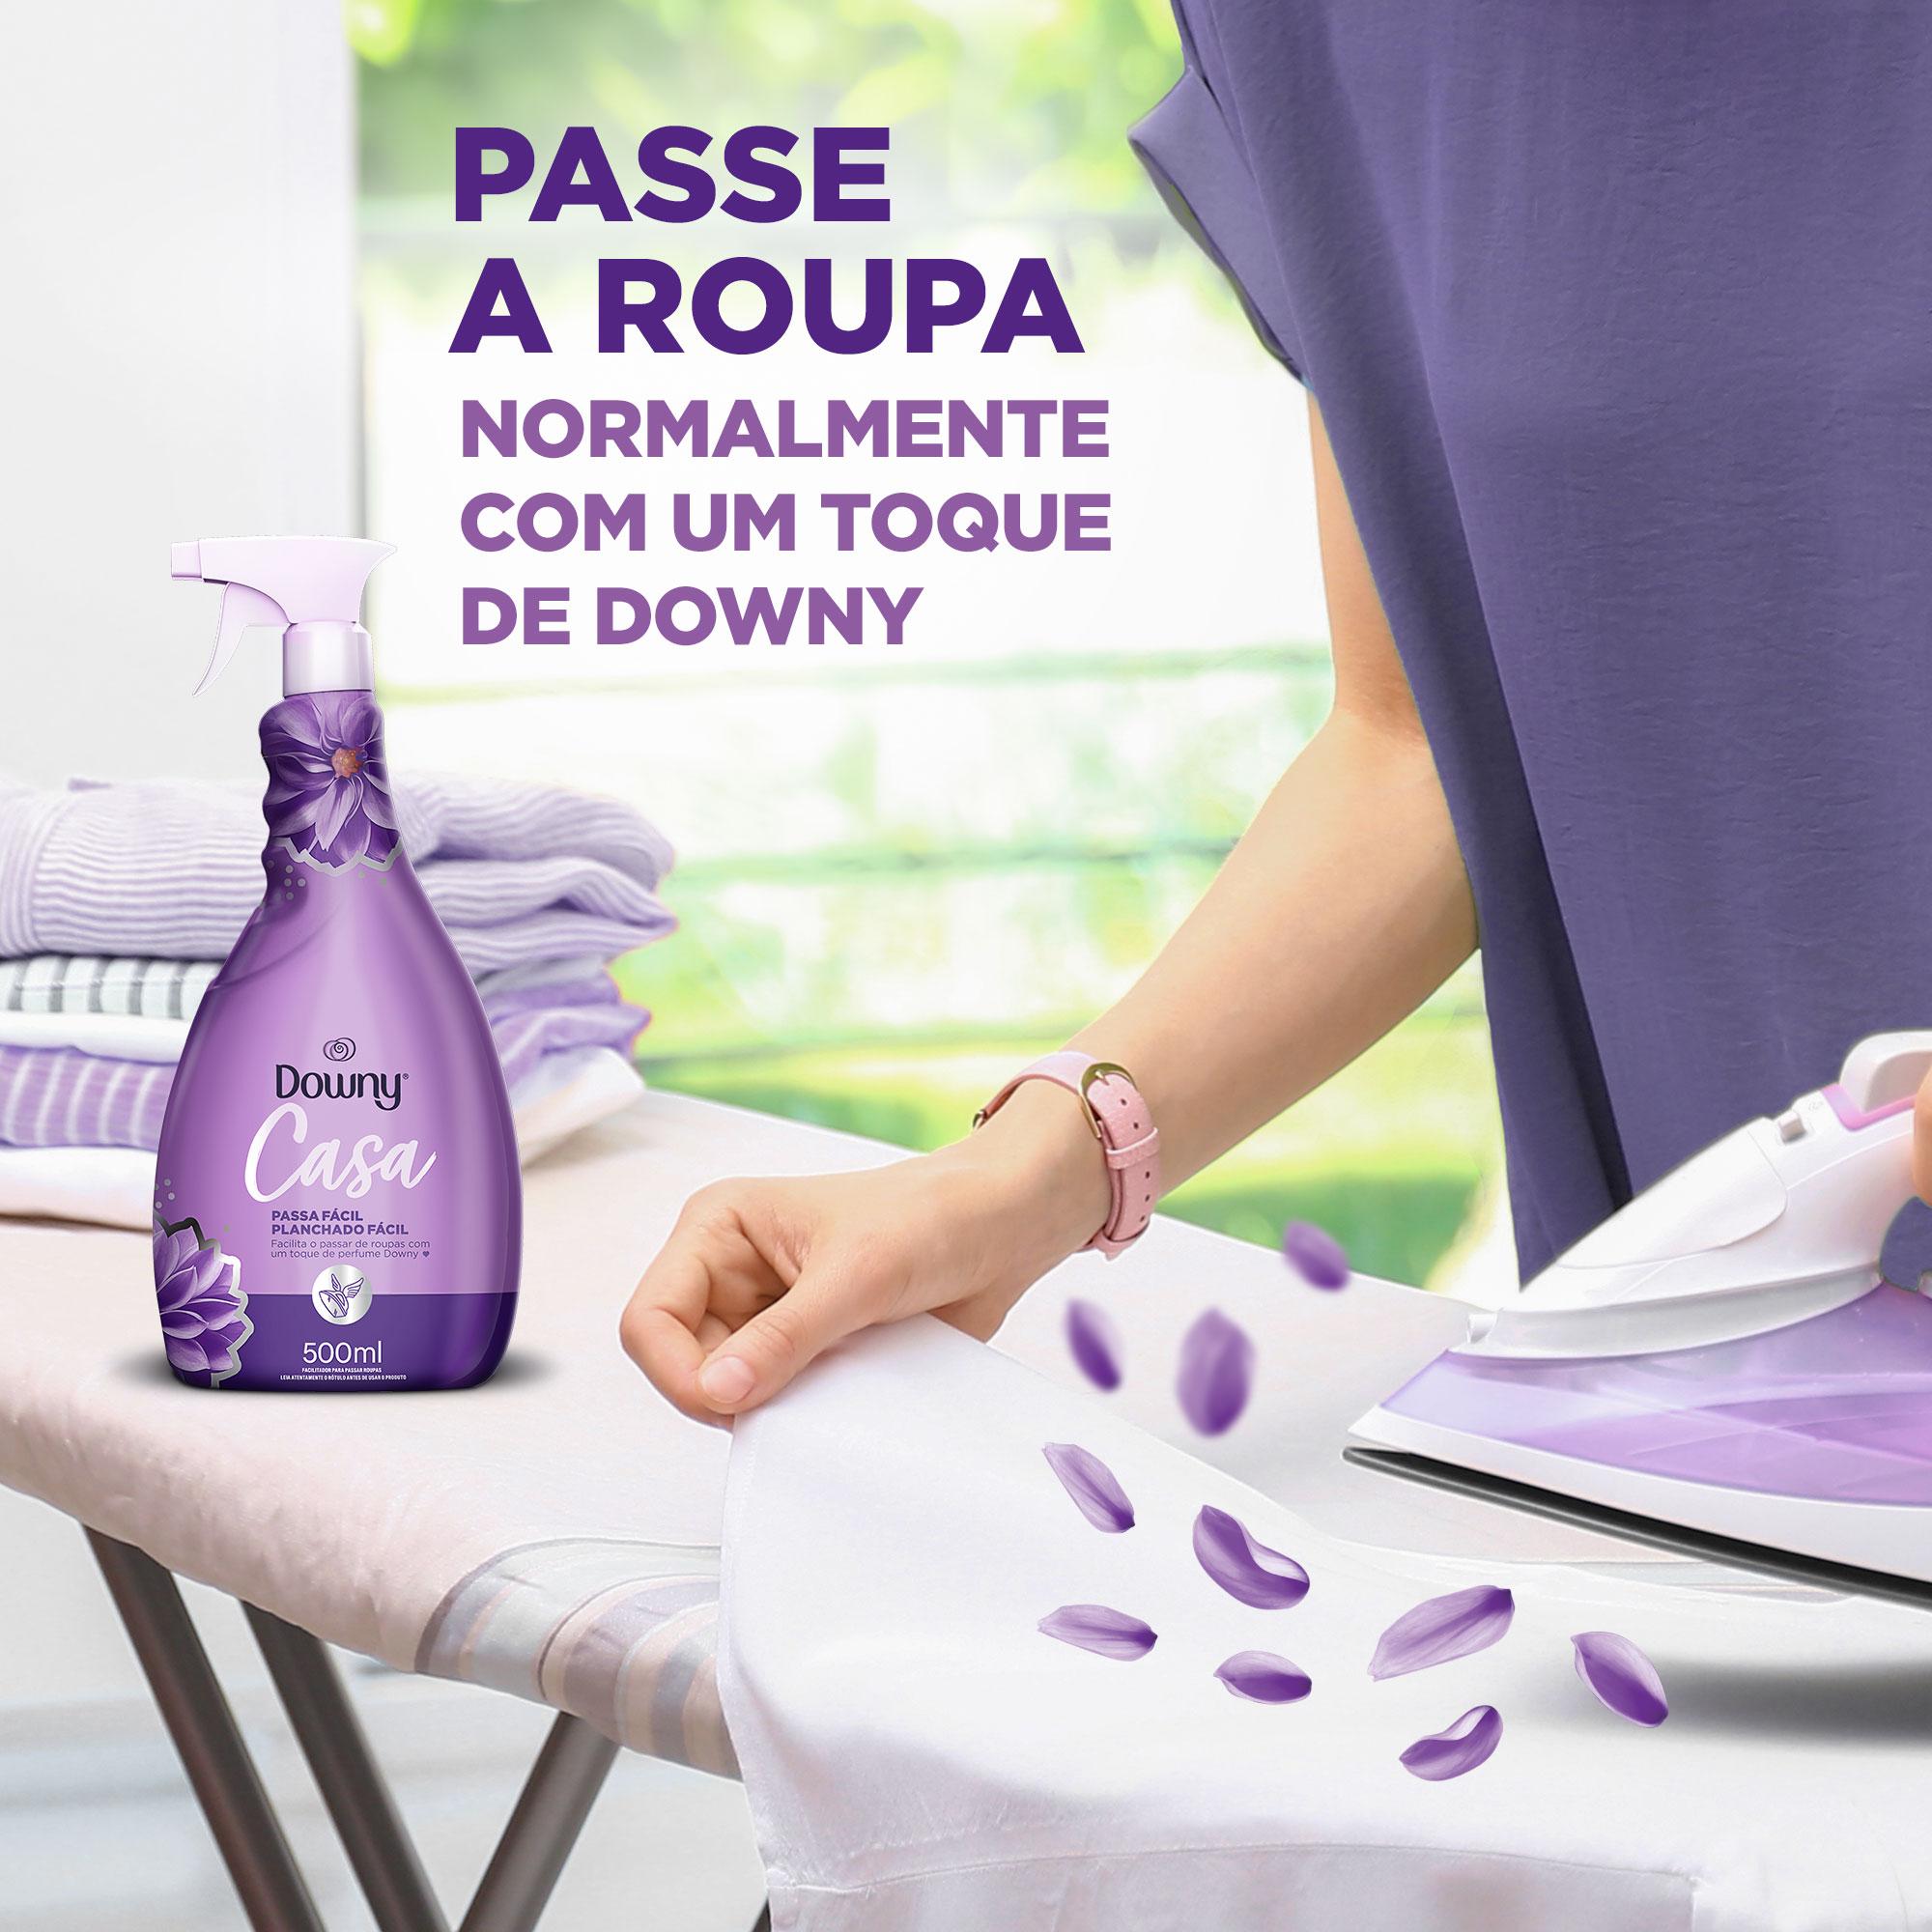 Downy Casa Passa Fácil Secondary 03